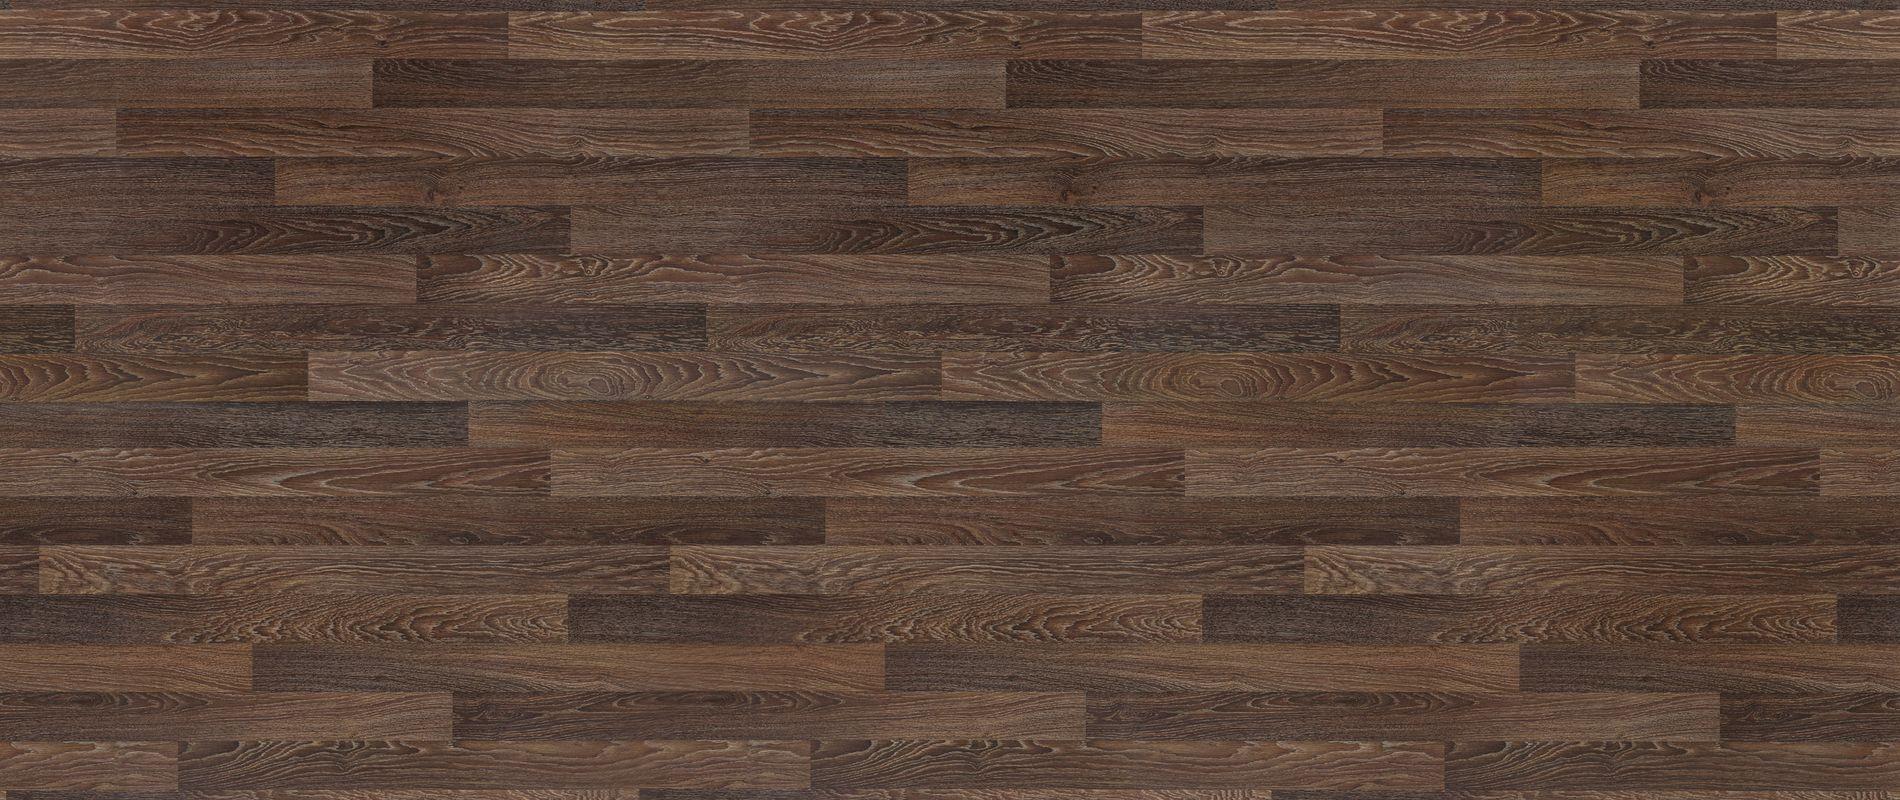 Holz Struktur anschnitt coupon bioboden wineo pureline timber in bahnen missouri